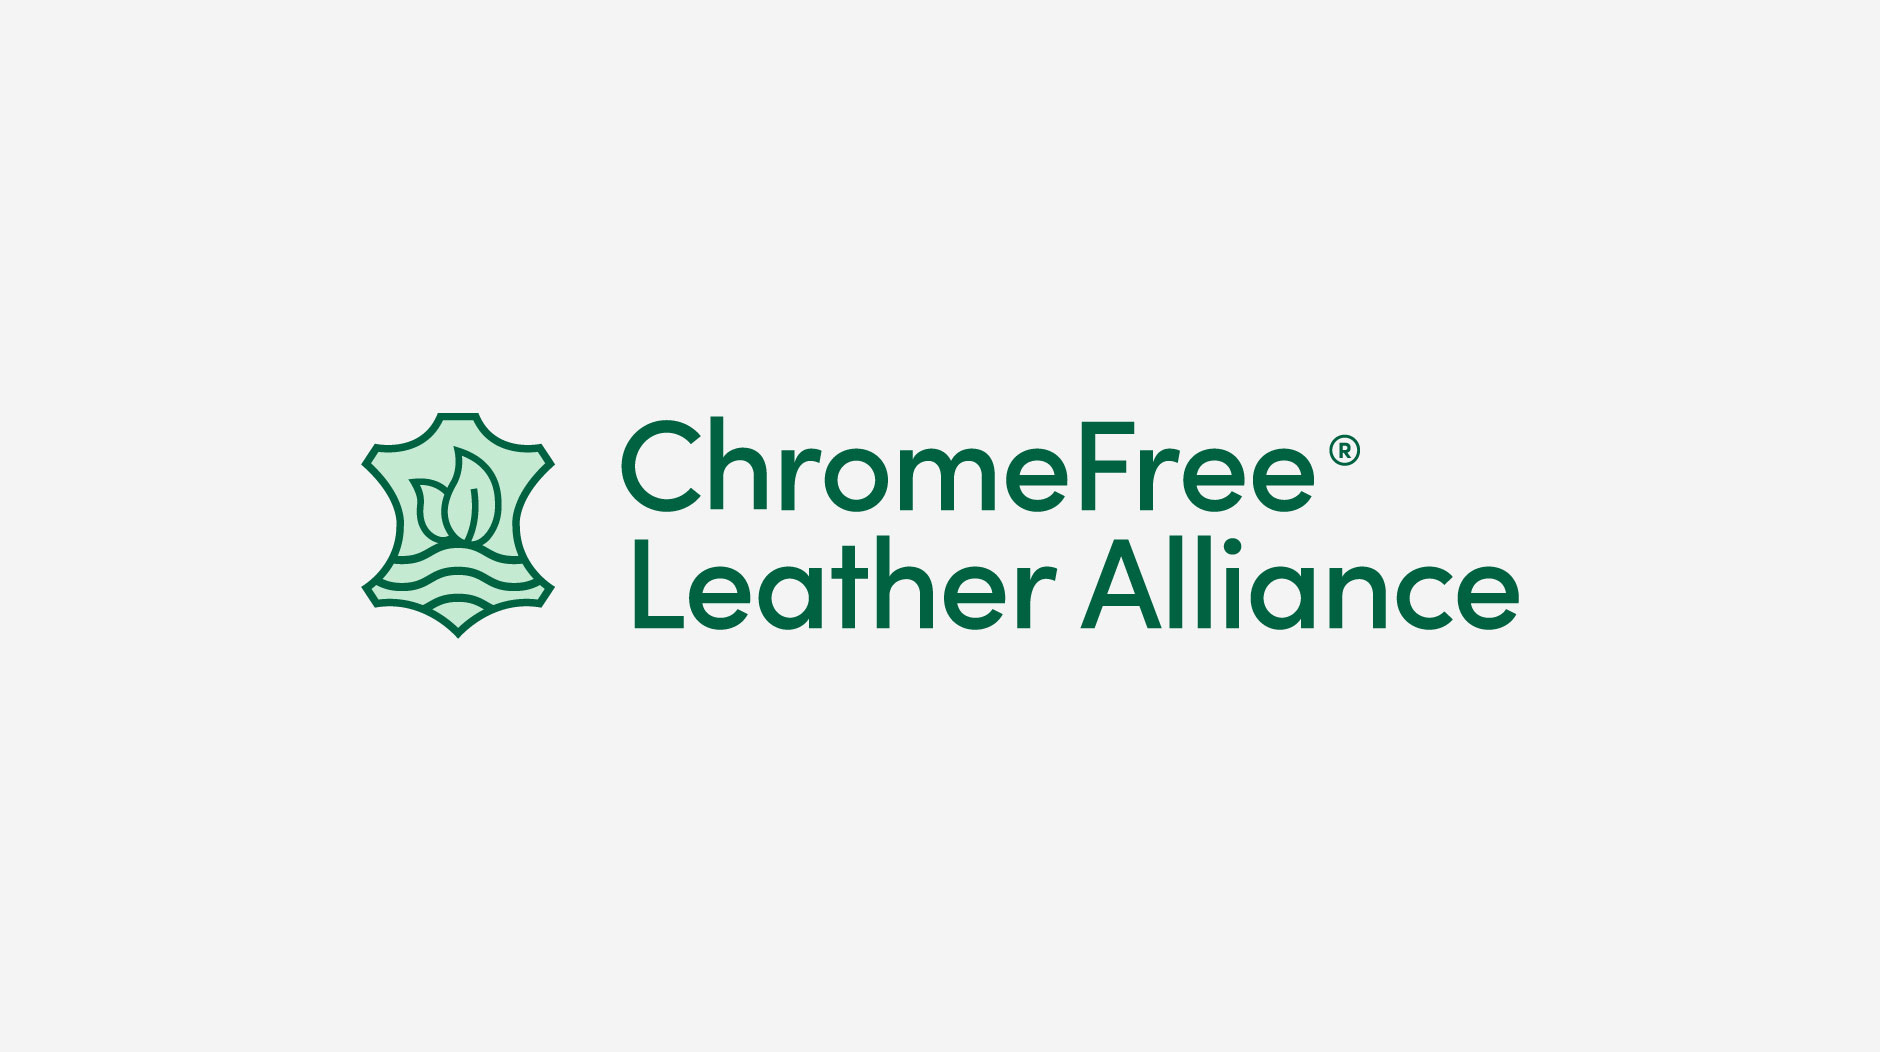 ChromeFree green logo lockup on an off-white background